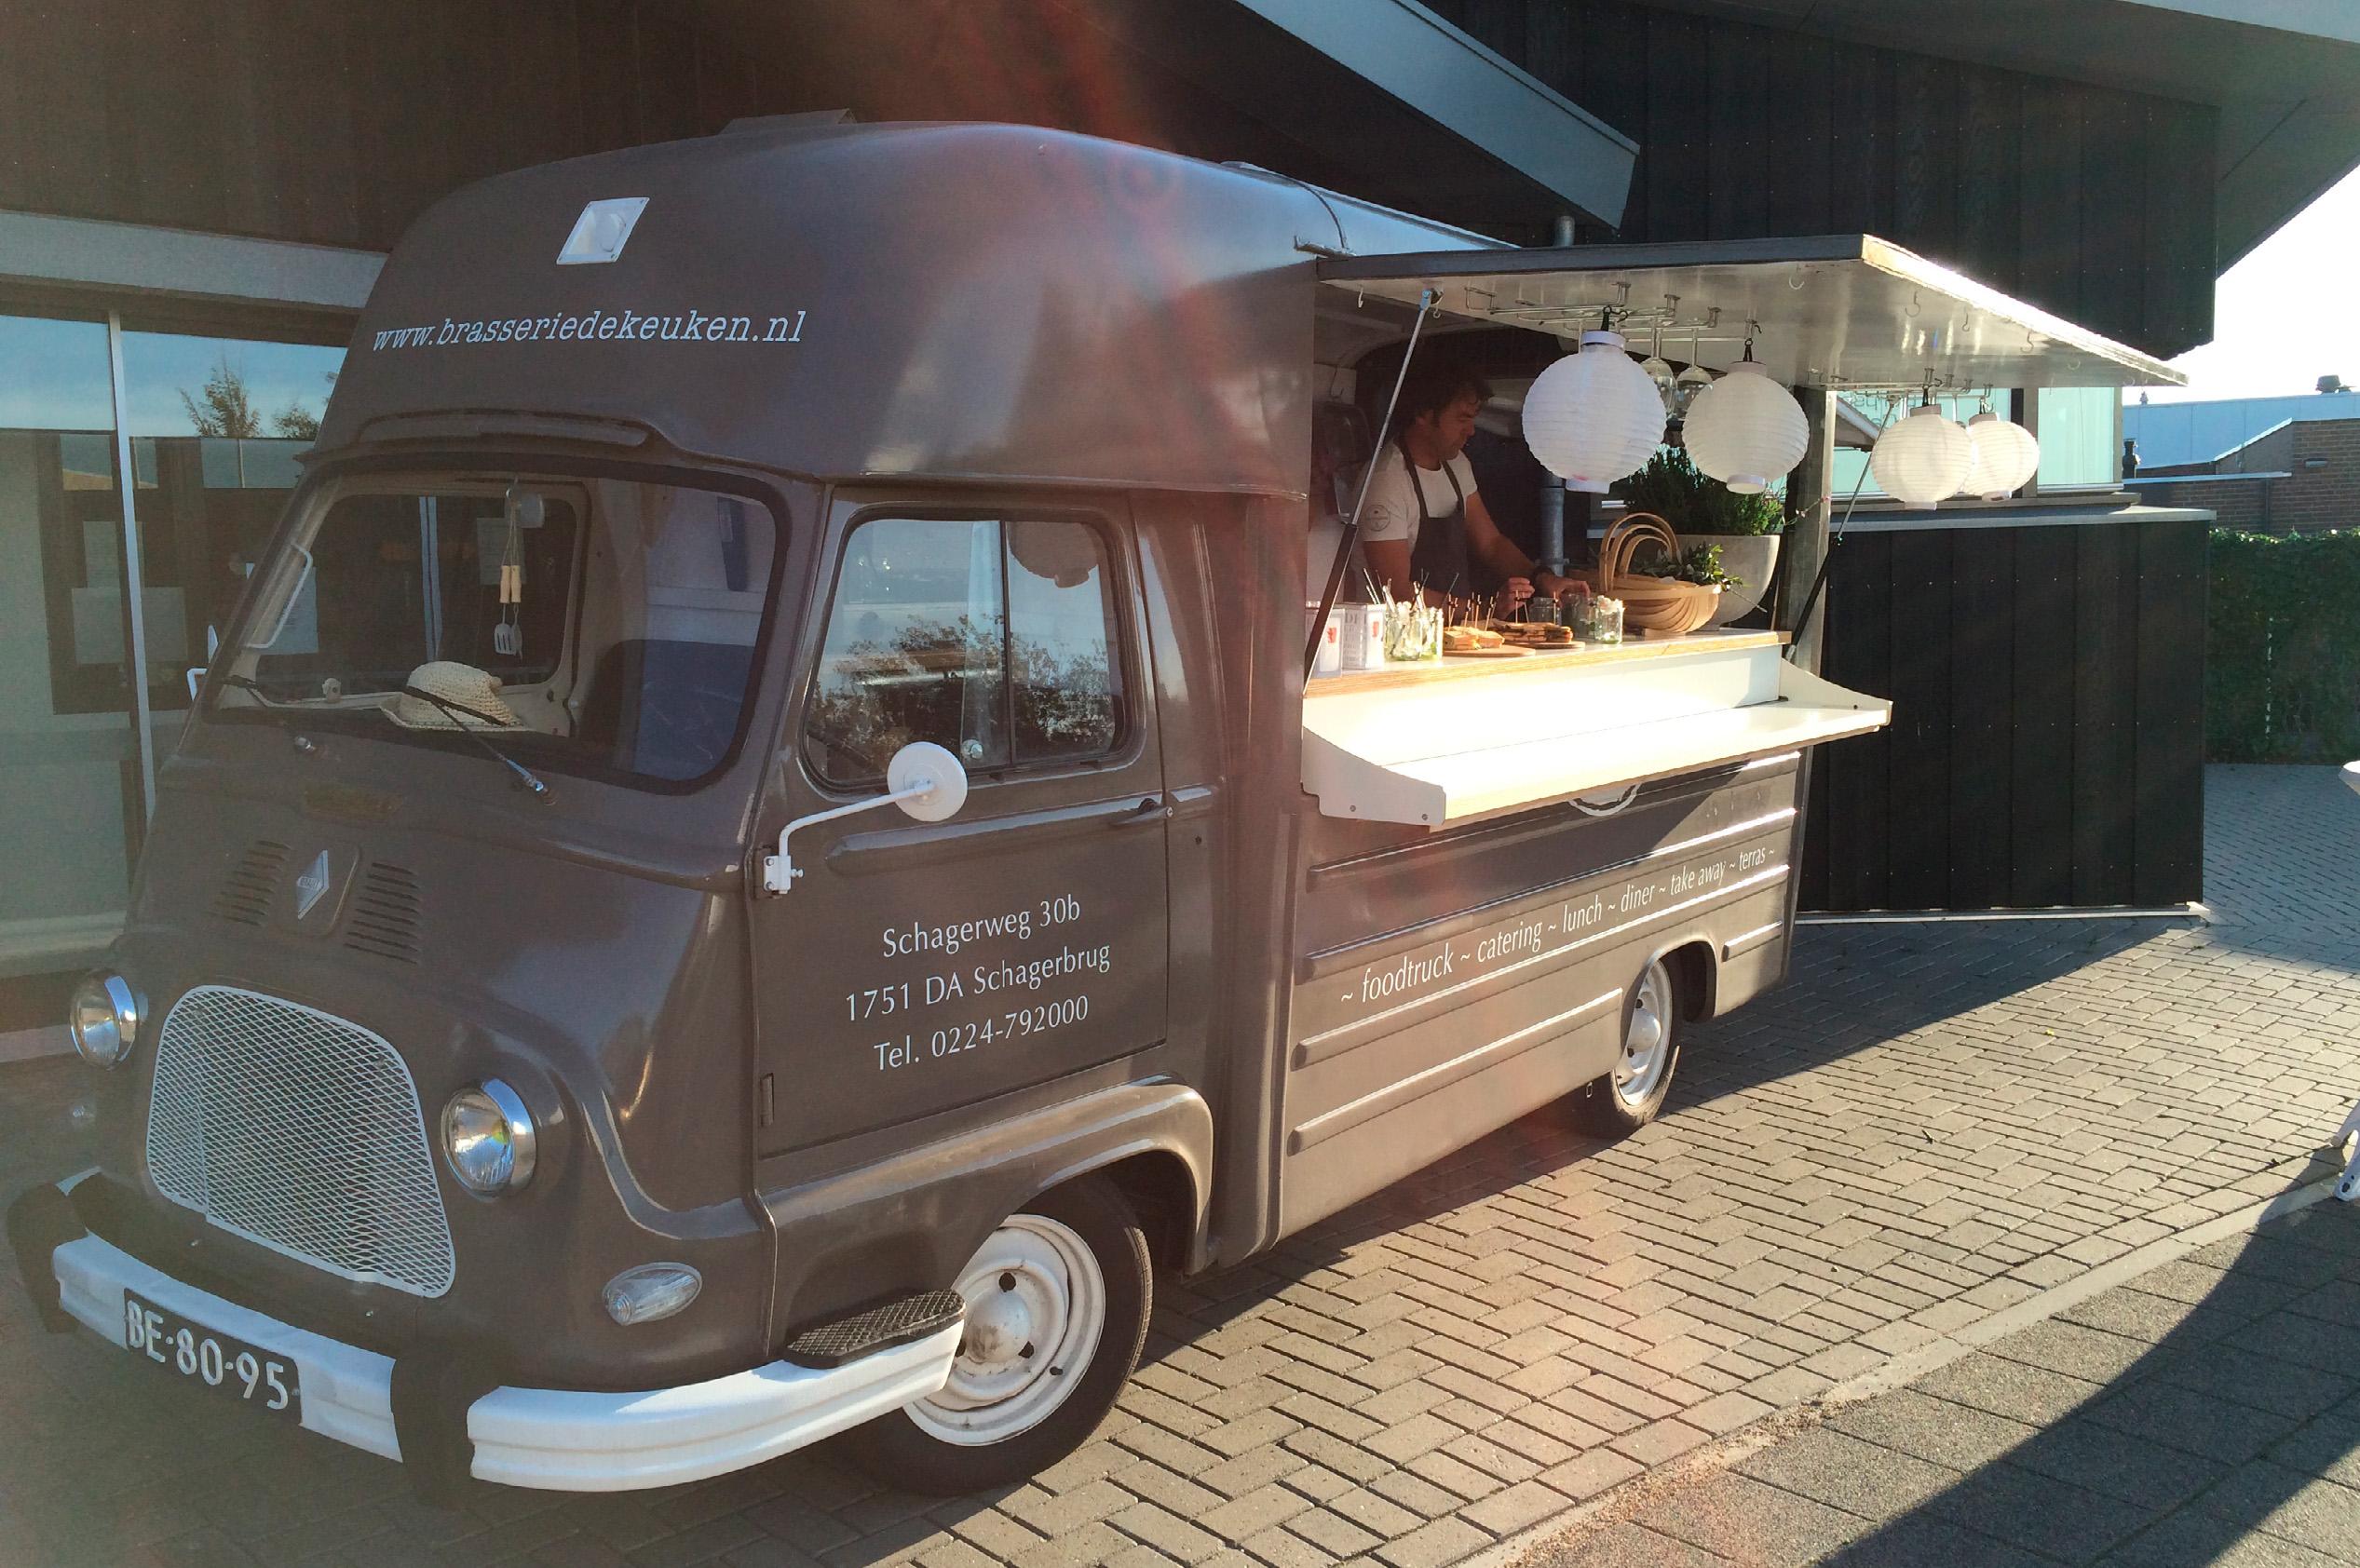 De Keuken Schagerbrug : Foodtruck de keuken schagerbrug noord holland